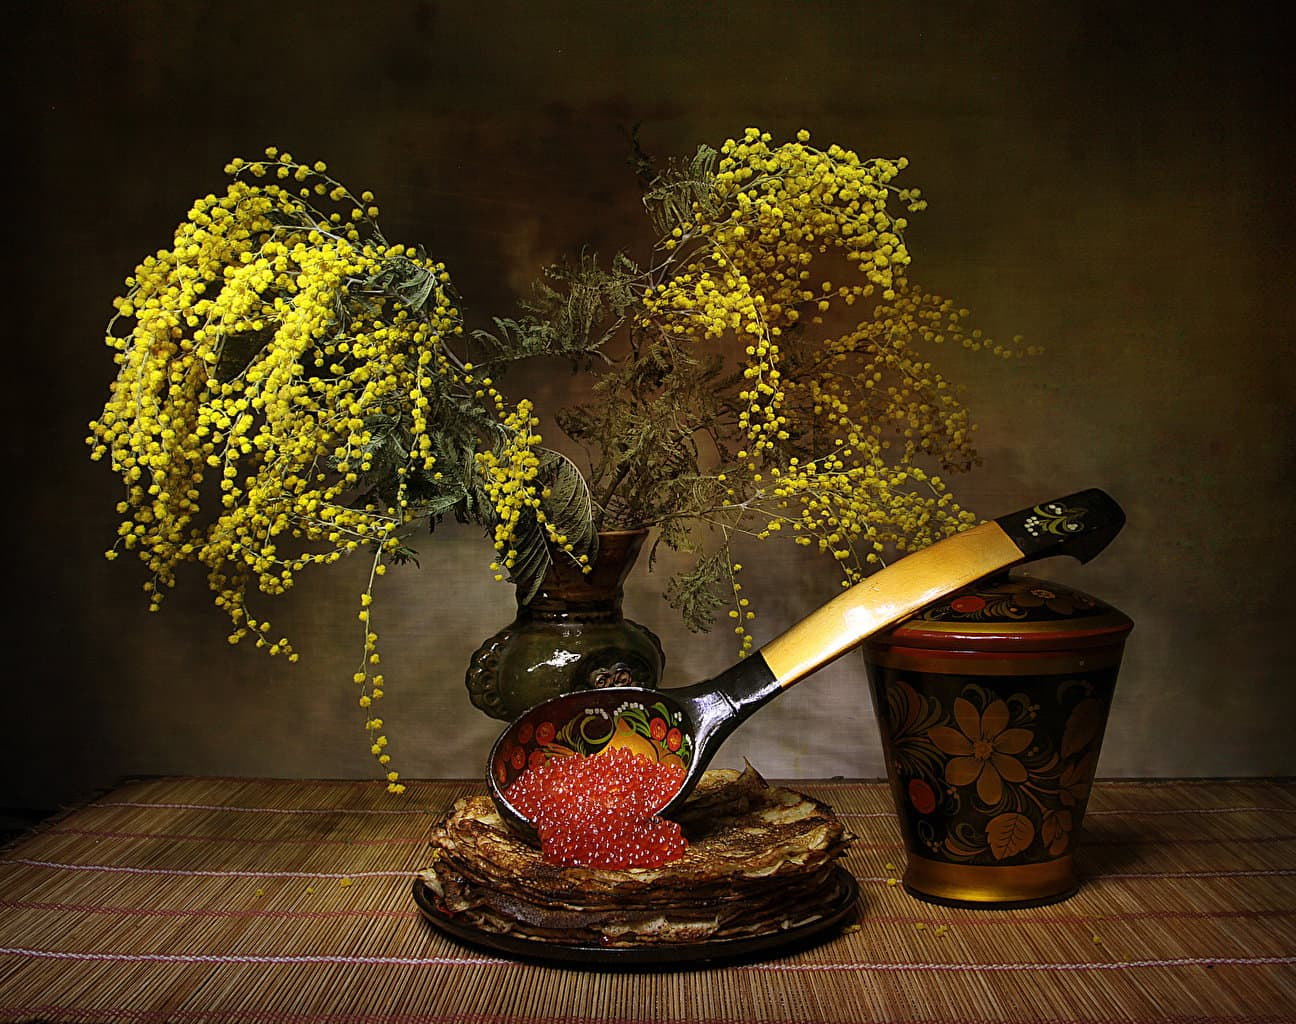 Mimosa_Pancake_Still-life_Caviar_545924_1296x1024.jpg